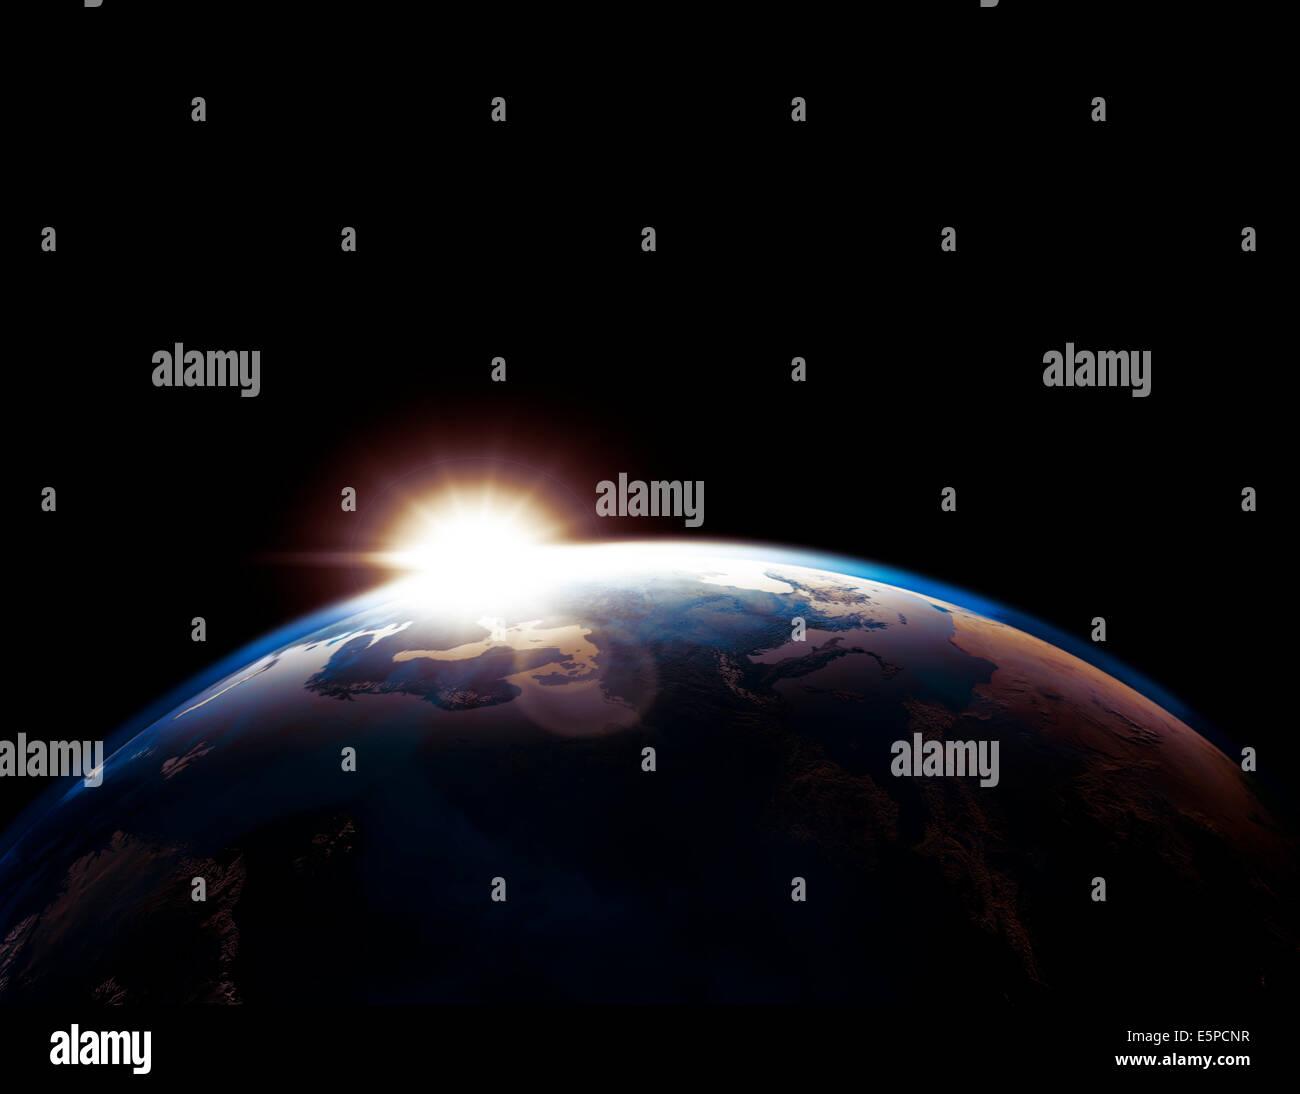 Esquema de globo terráqueo iluminado por el sol naciente aislado sobre fondo negro Imagen De Stock